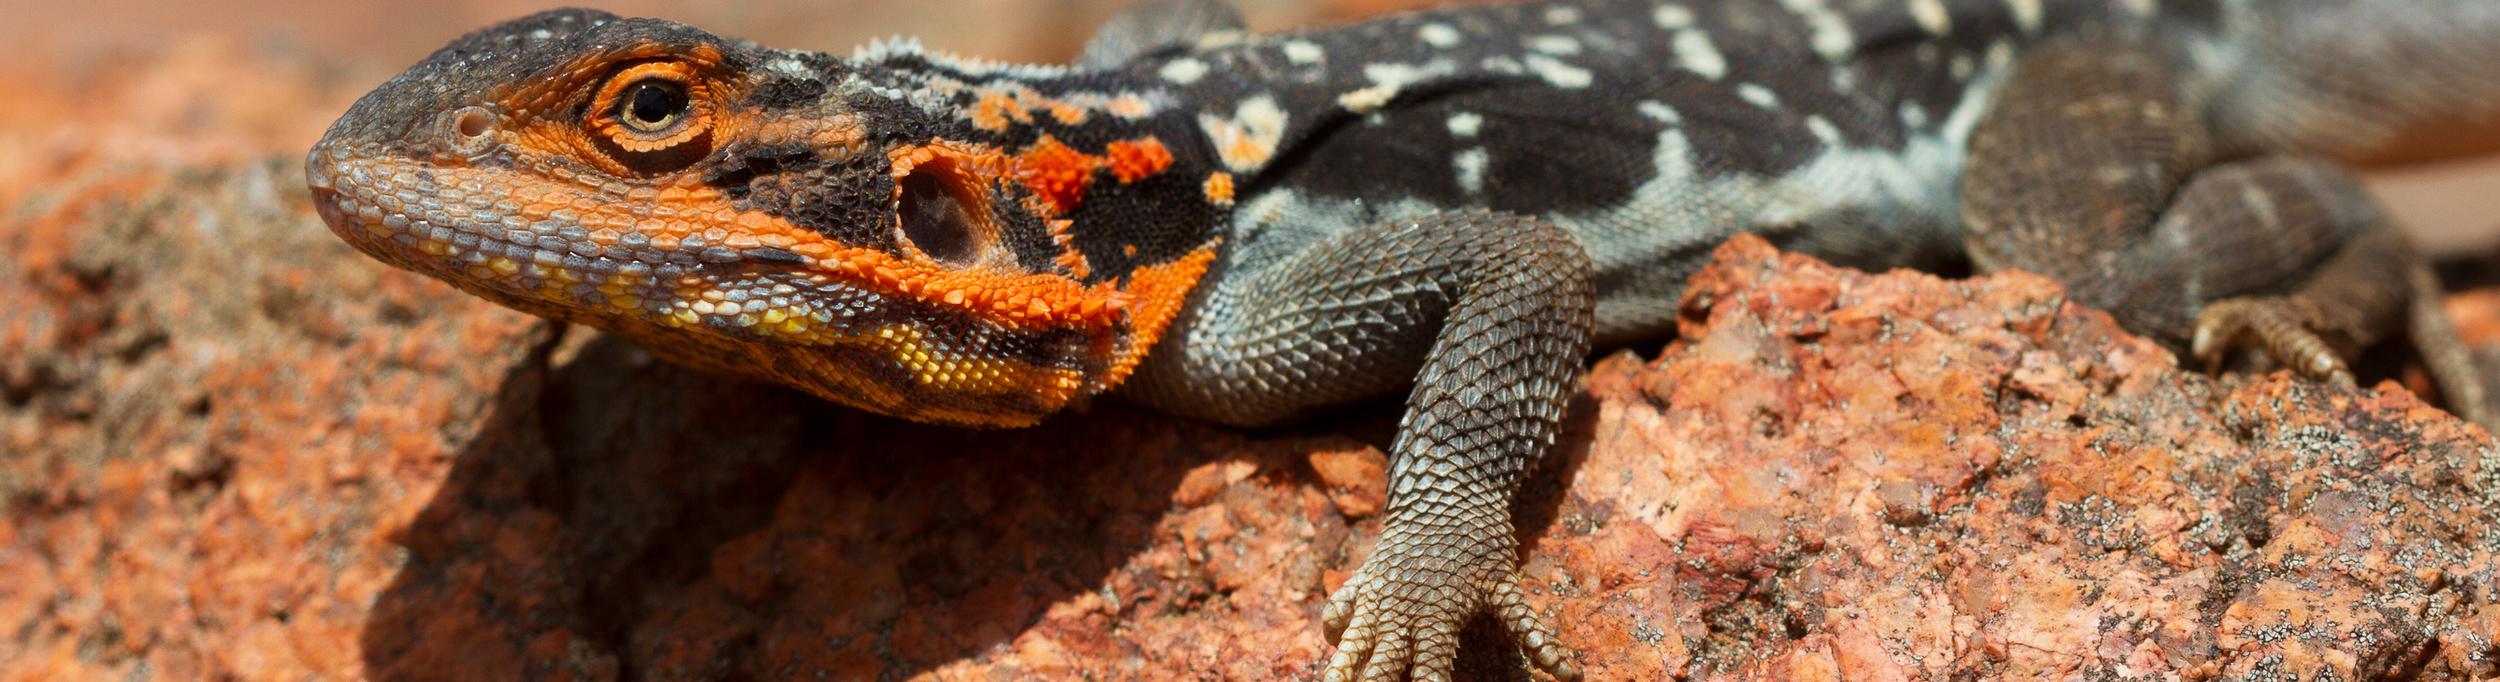 A male peninsula dragon,  Ctenophorus fionni . Kokatha Station, South Australia, 2012. Photo by Angus Kennedy.